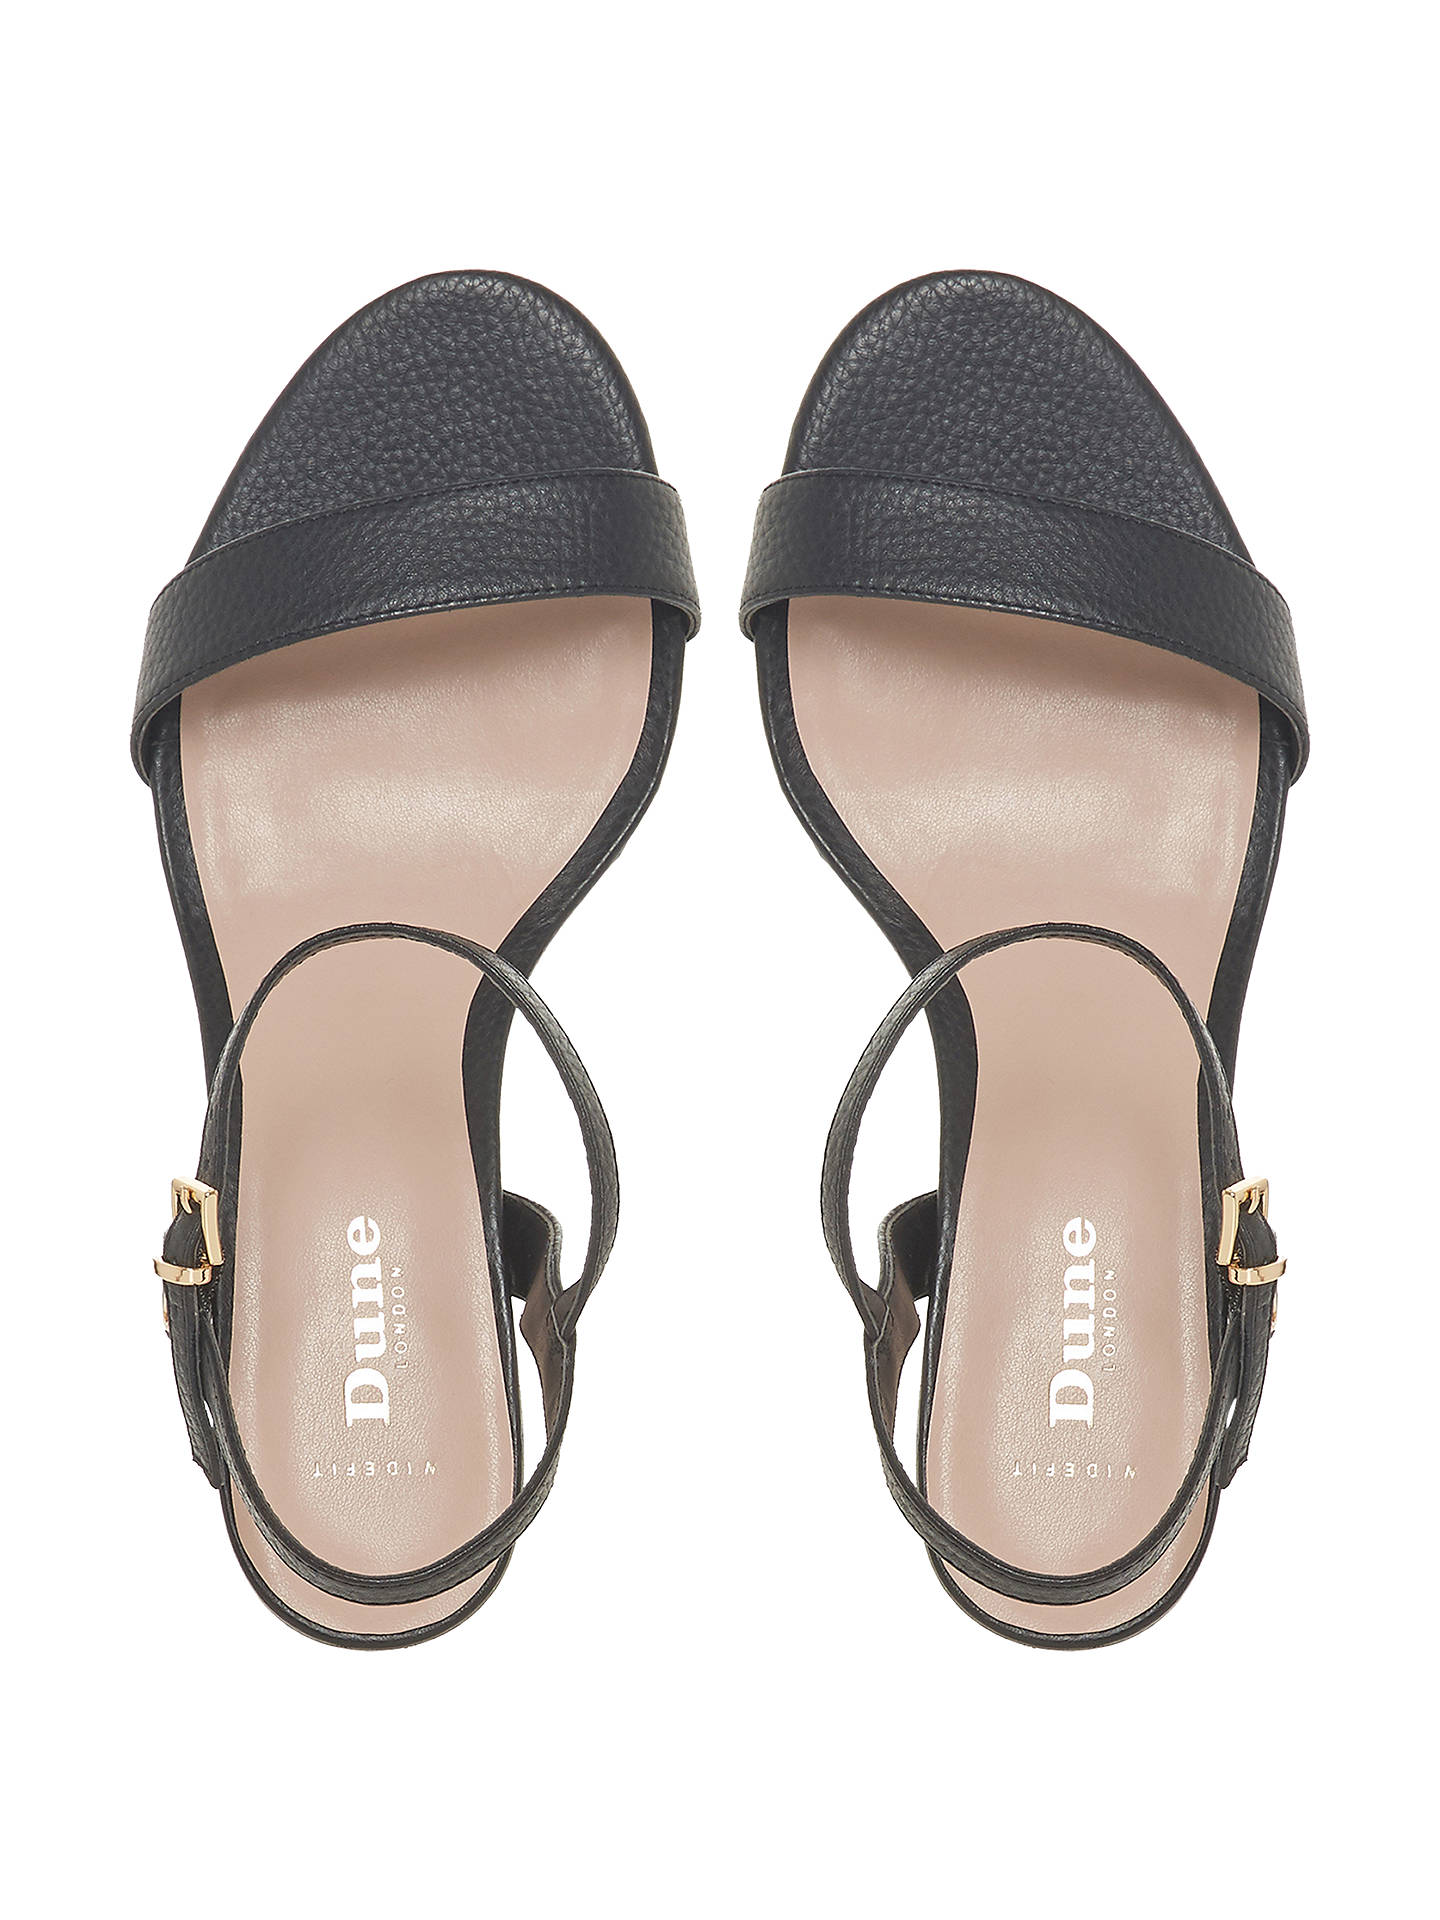 5208dfb10ec Dune Wide Fit Jiggle Block Heel Sandals at John Lewis   Partners